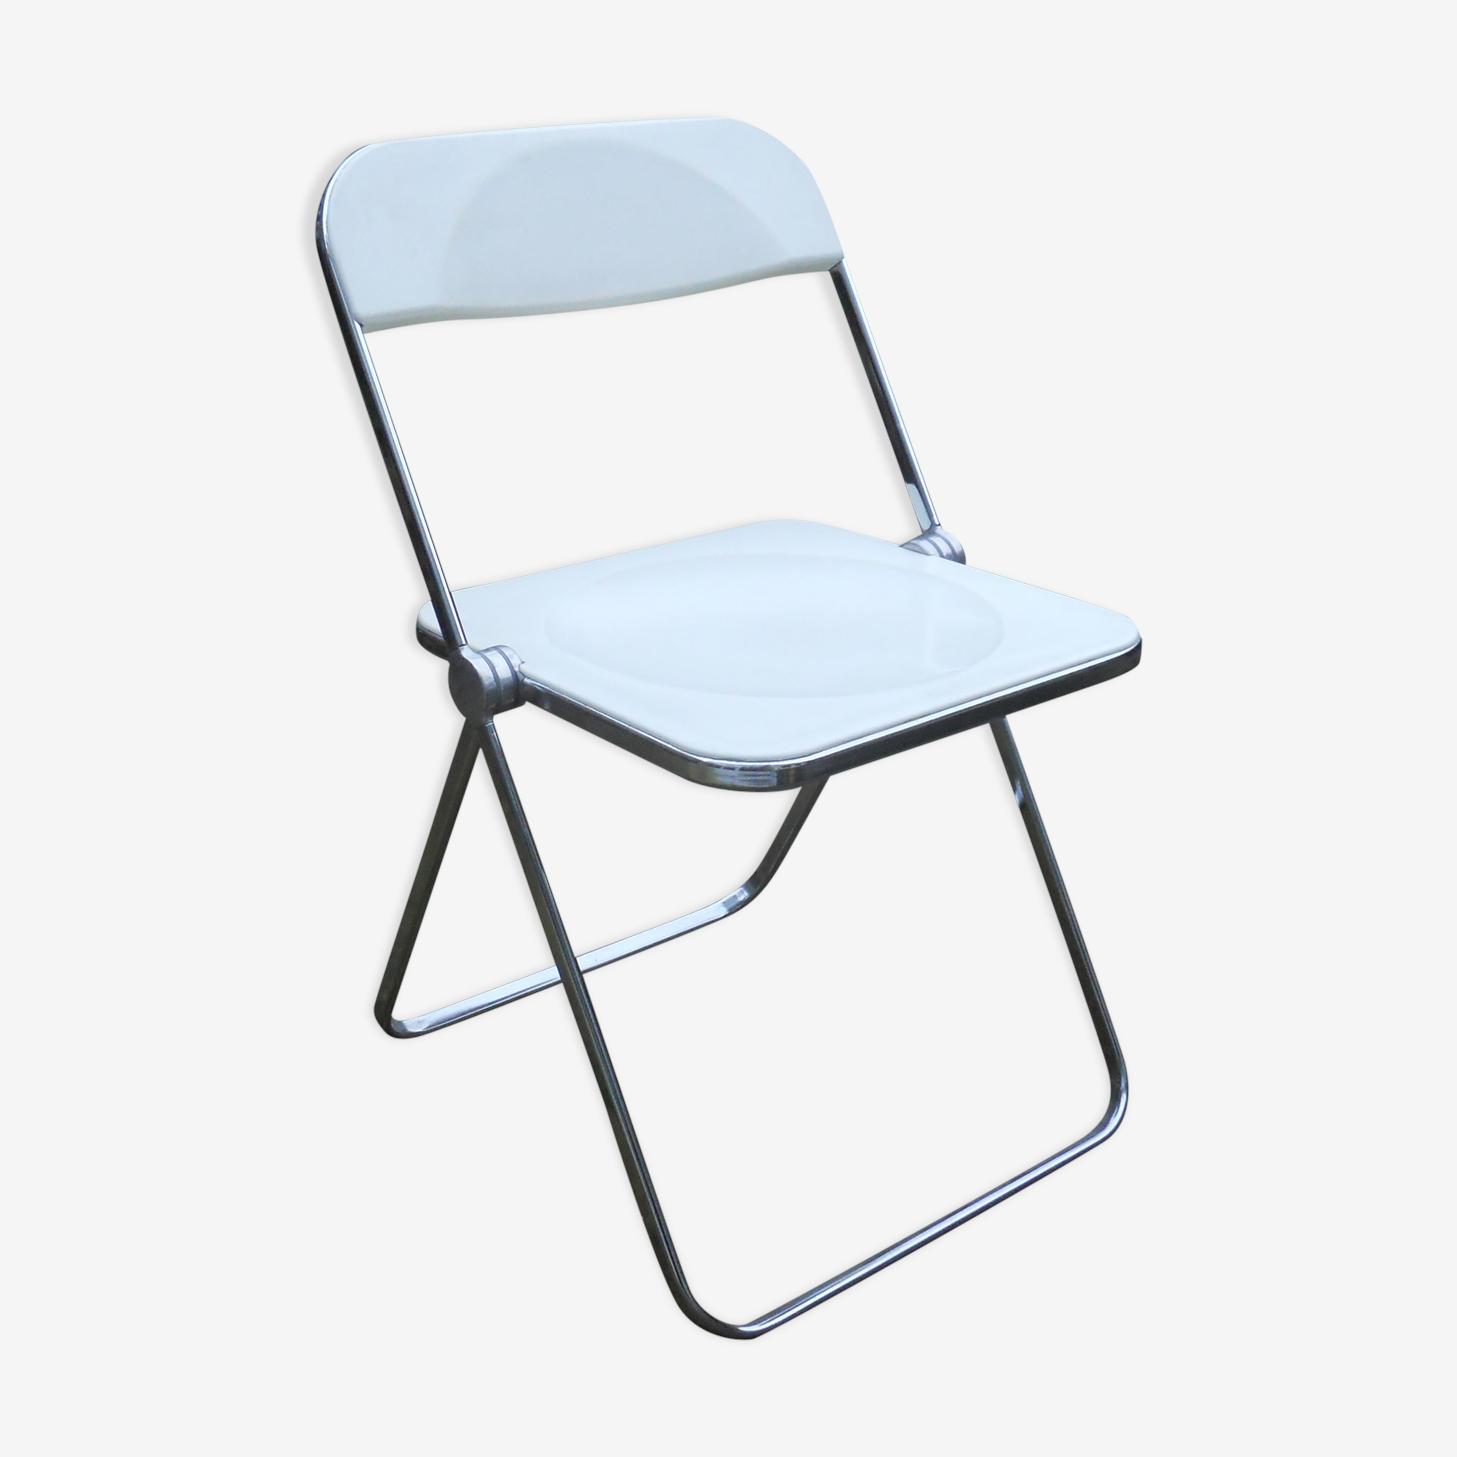 Chaise plia blanche Giancarlo Piretti